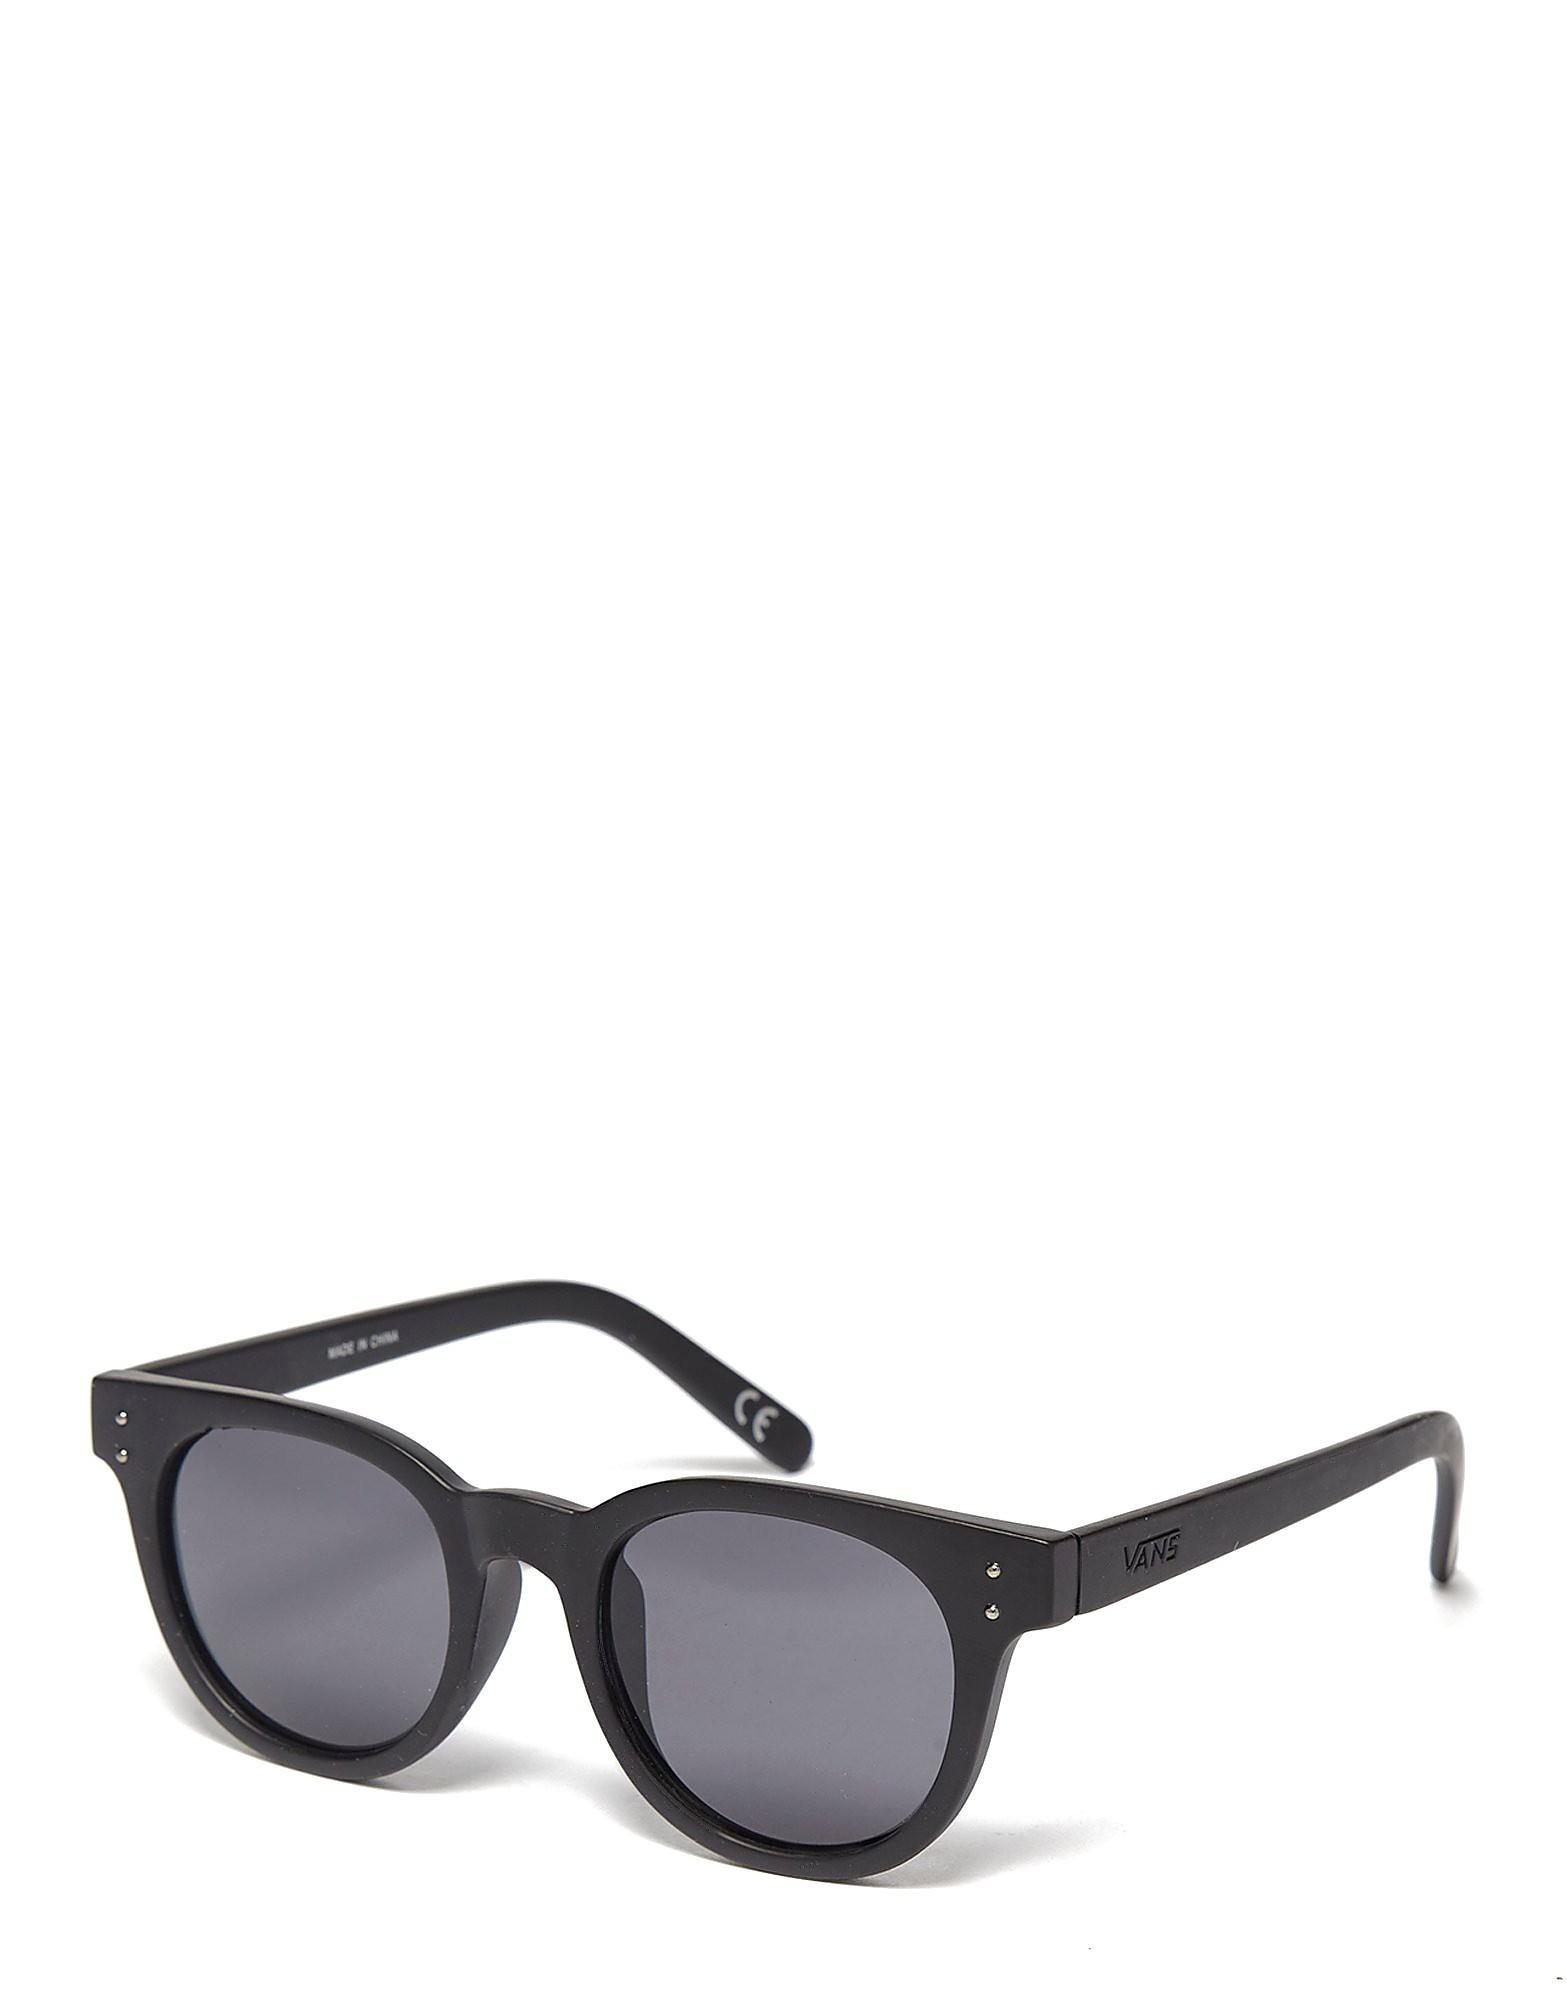 Vans Welborn Sunglasses